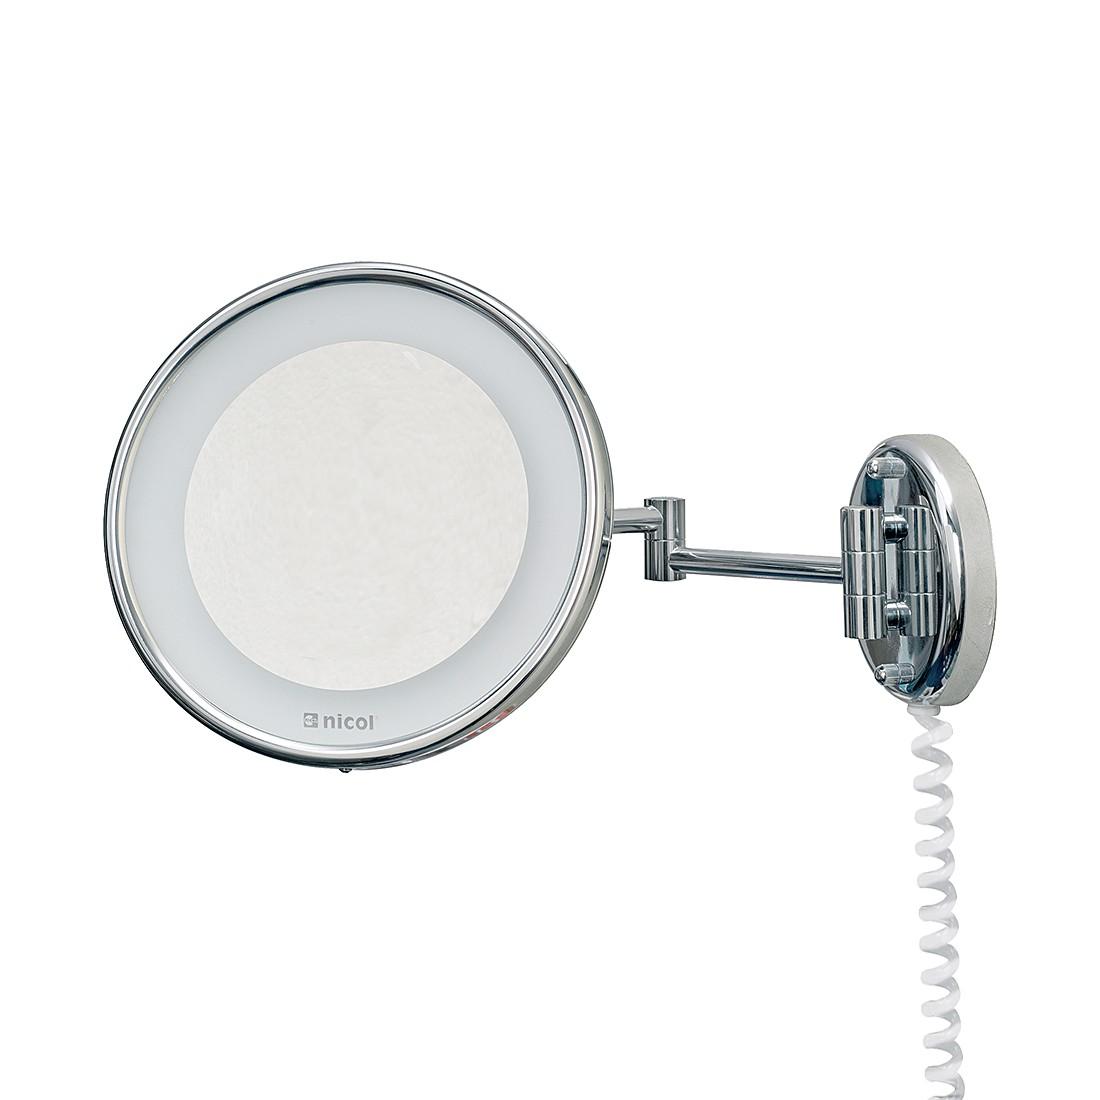 Wandspiegel Jenny   chroomkleurig LED verlichting 5 voudige vergroting_ Nicol Wohnausstattungen